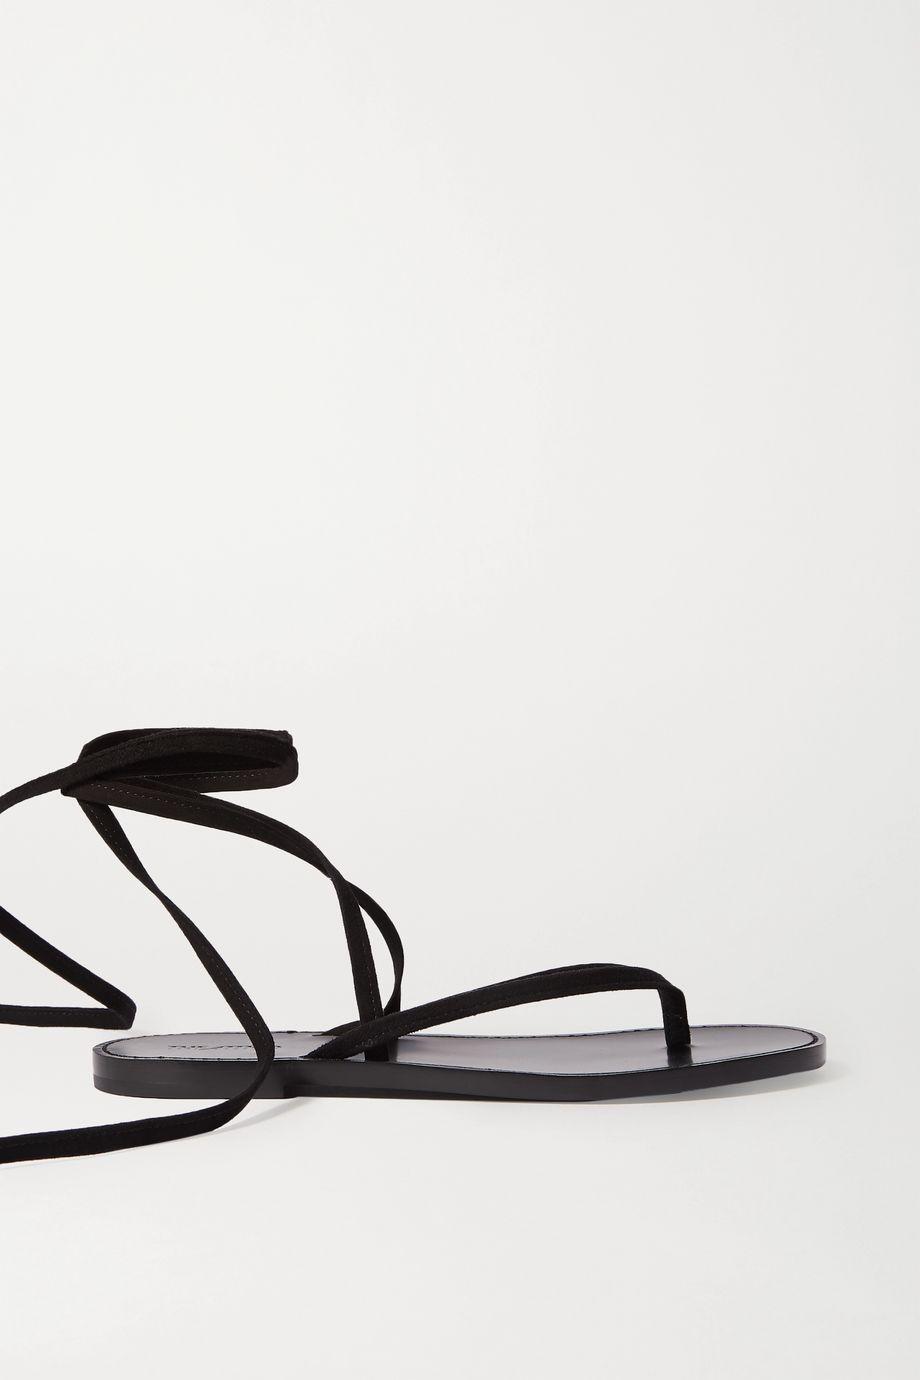 The Attico Flora leather sandals